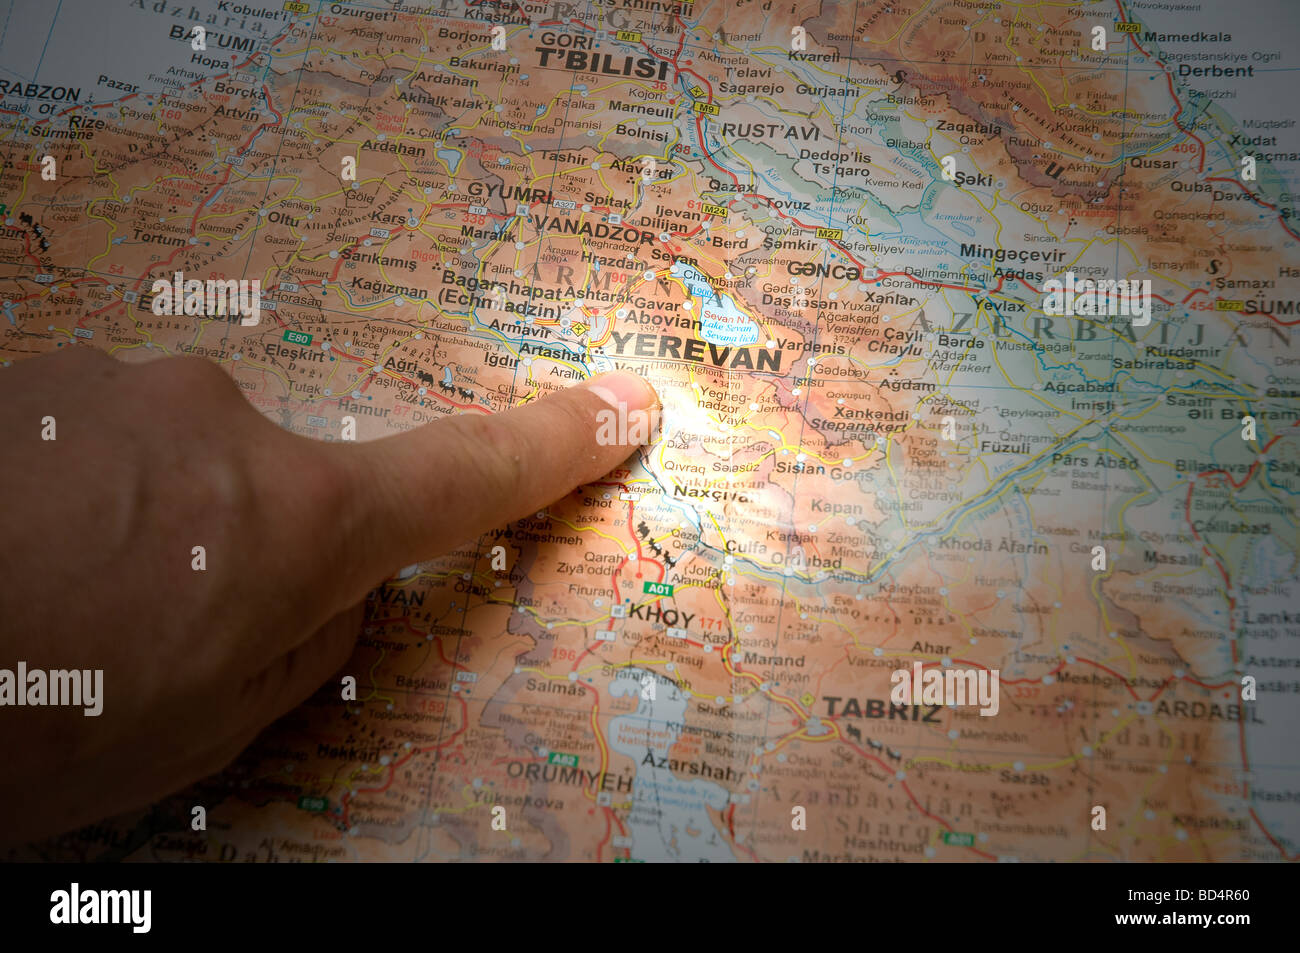 Focus on Yerevan, Armenia - Stock Image